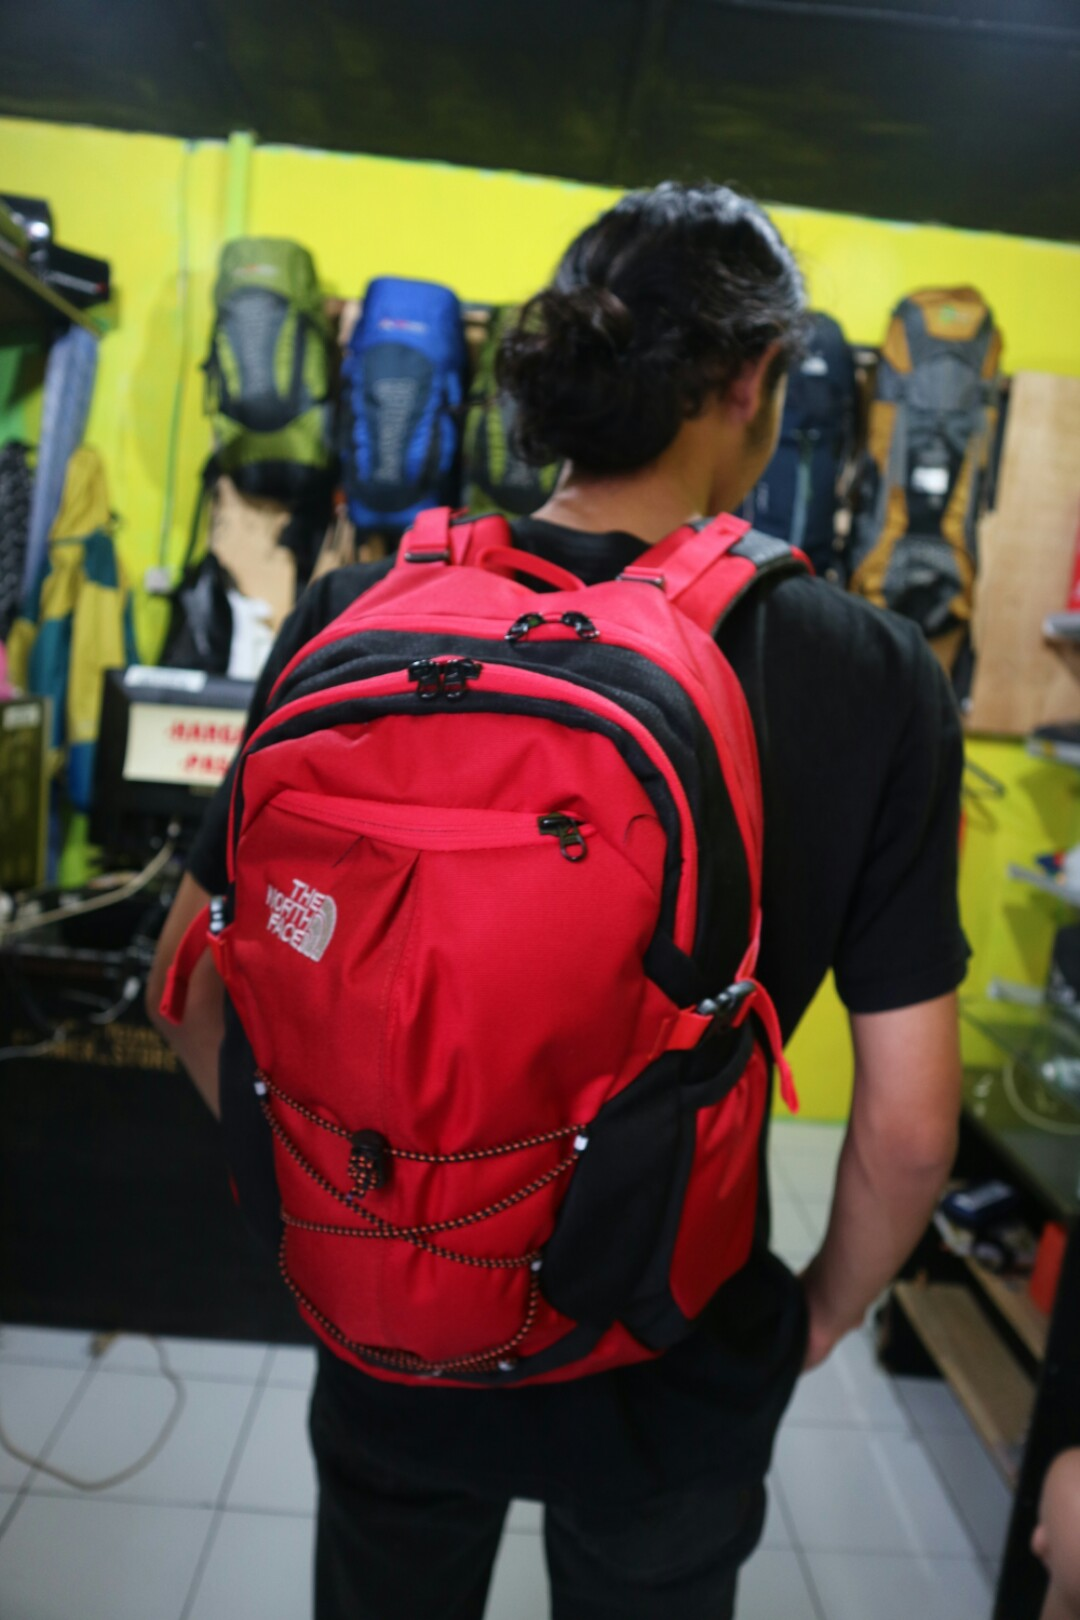 Tas Daypack Backpack Summit Gunung Outdoor Ransel Camping Kuliah Sekolah Sports Other Equipment On Carousell